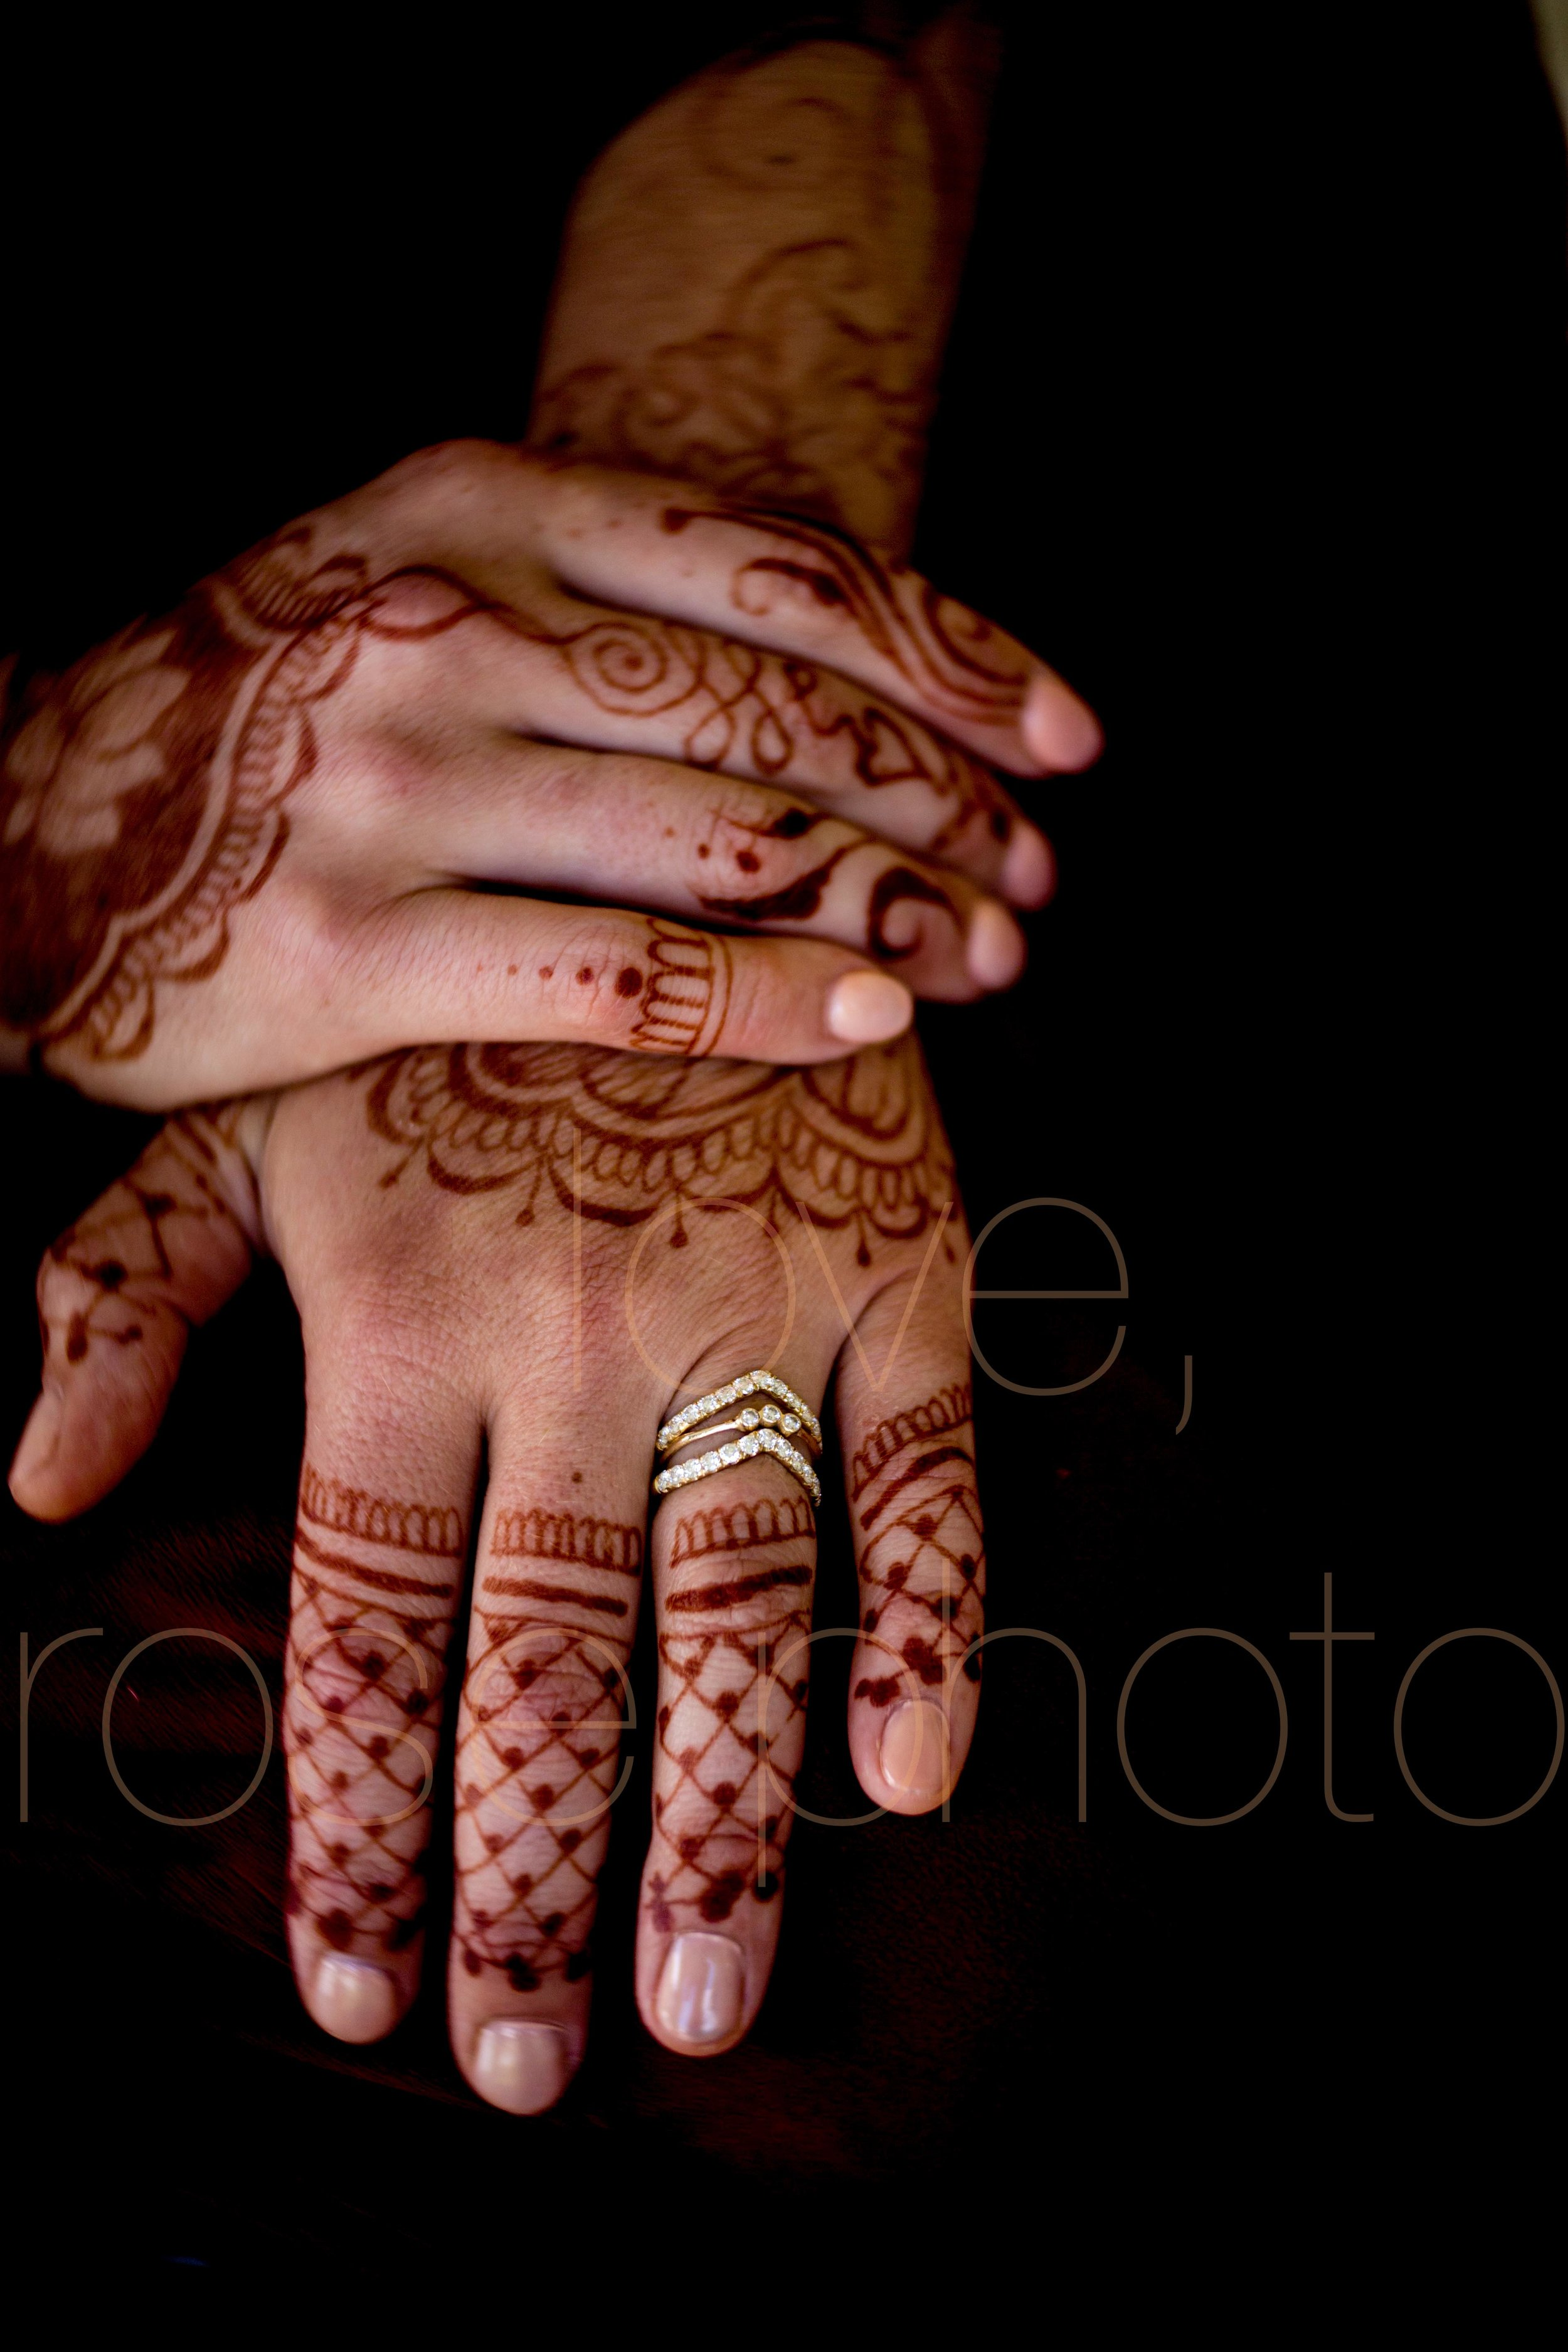 Jane Krame + Jason Ashevegas married asheville best wedding photographers -31.jpg